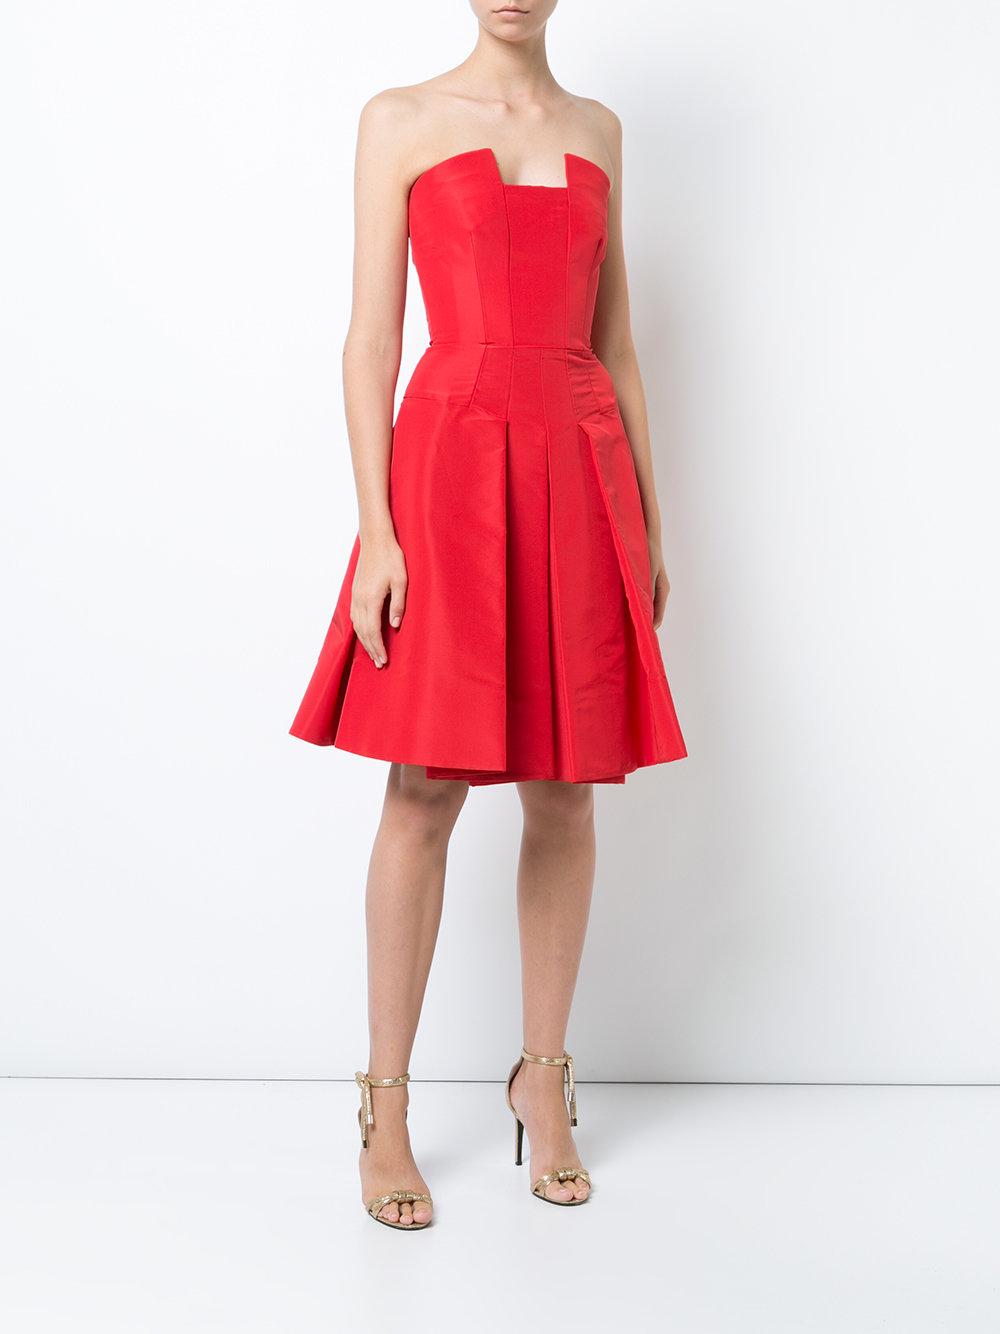 Oscar De La Renta Strapless Flared Dress